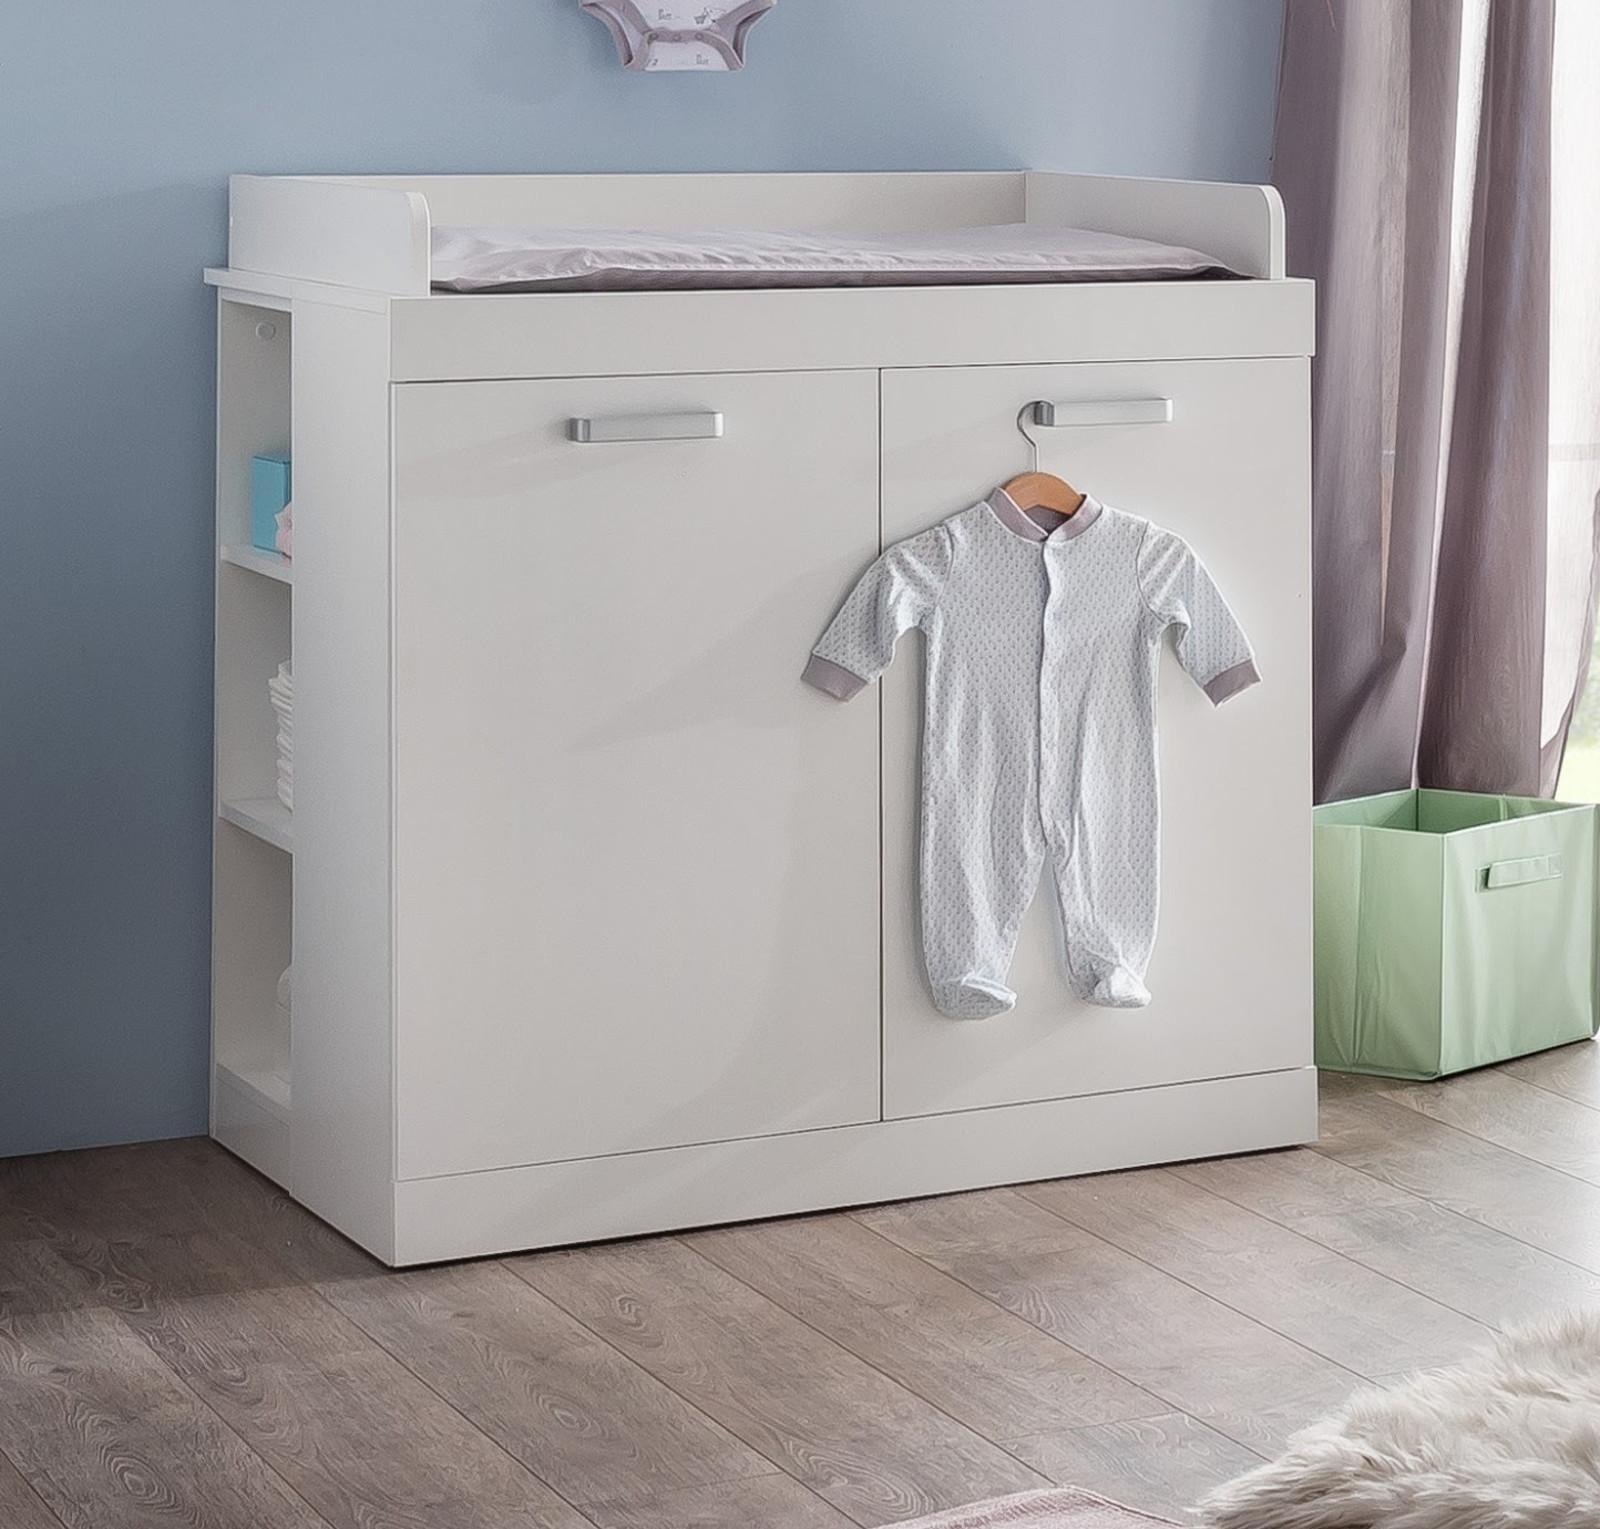 wickelkommode wei kommode mit wickelansatz opt mit regal baby m bel ronja ebay. Black Bedroom Furniture Sets. Home Design Ideas